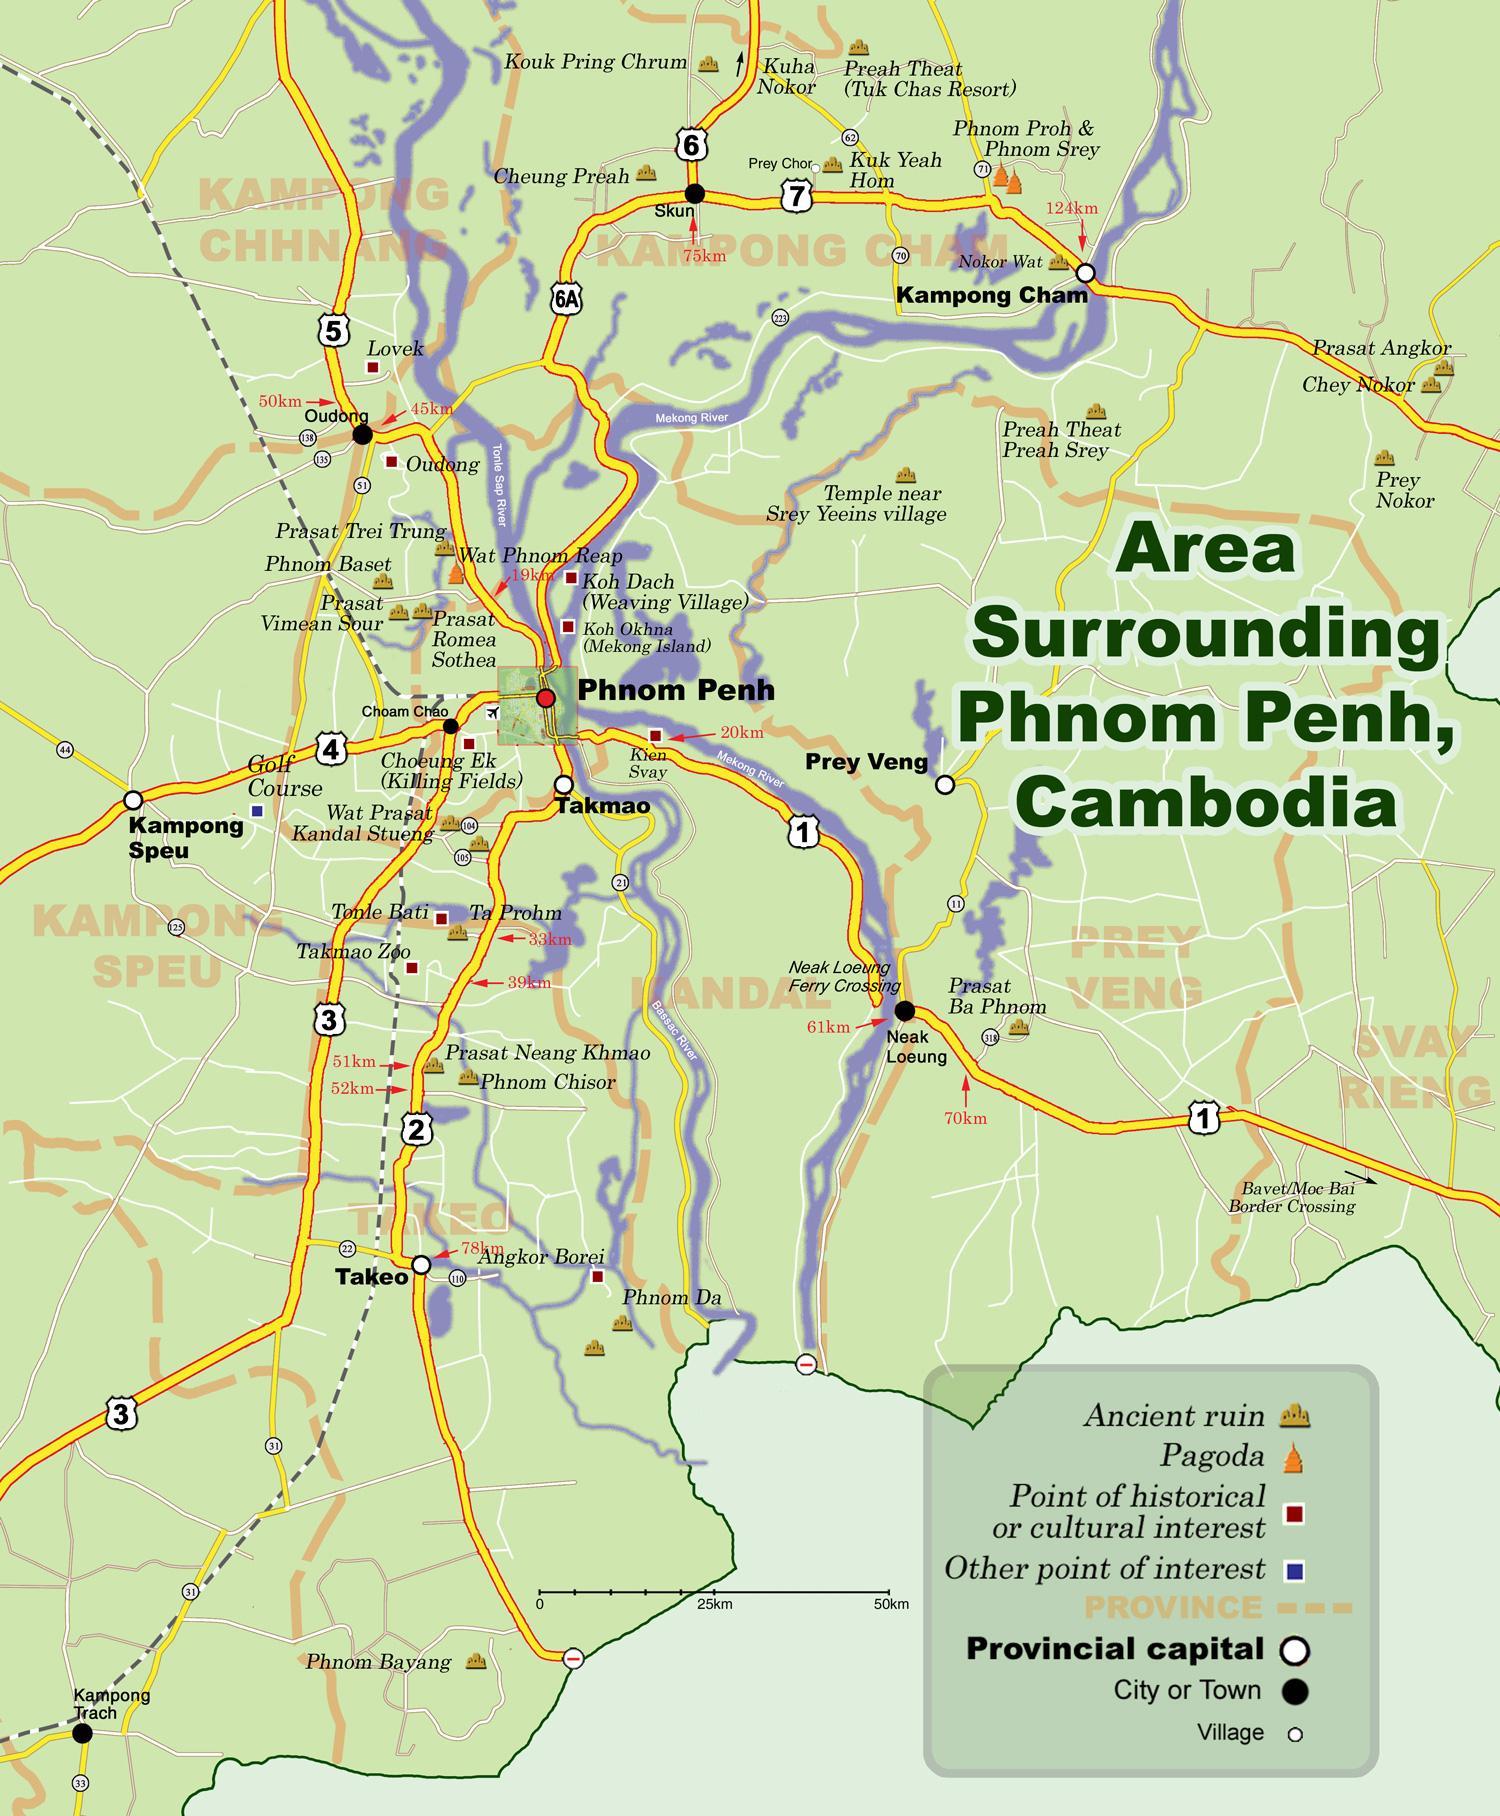 kambodsja kart Phnom penh i Kambodsja kart   Kart over phnom penh i Kambodsja  kambodsja kart